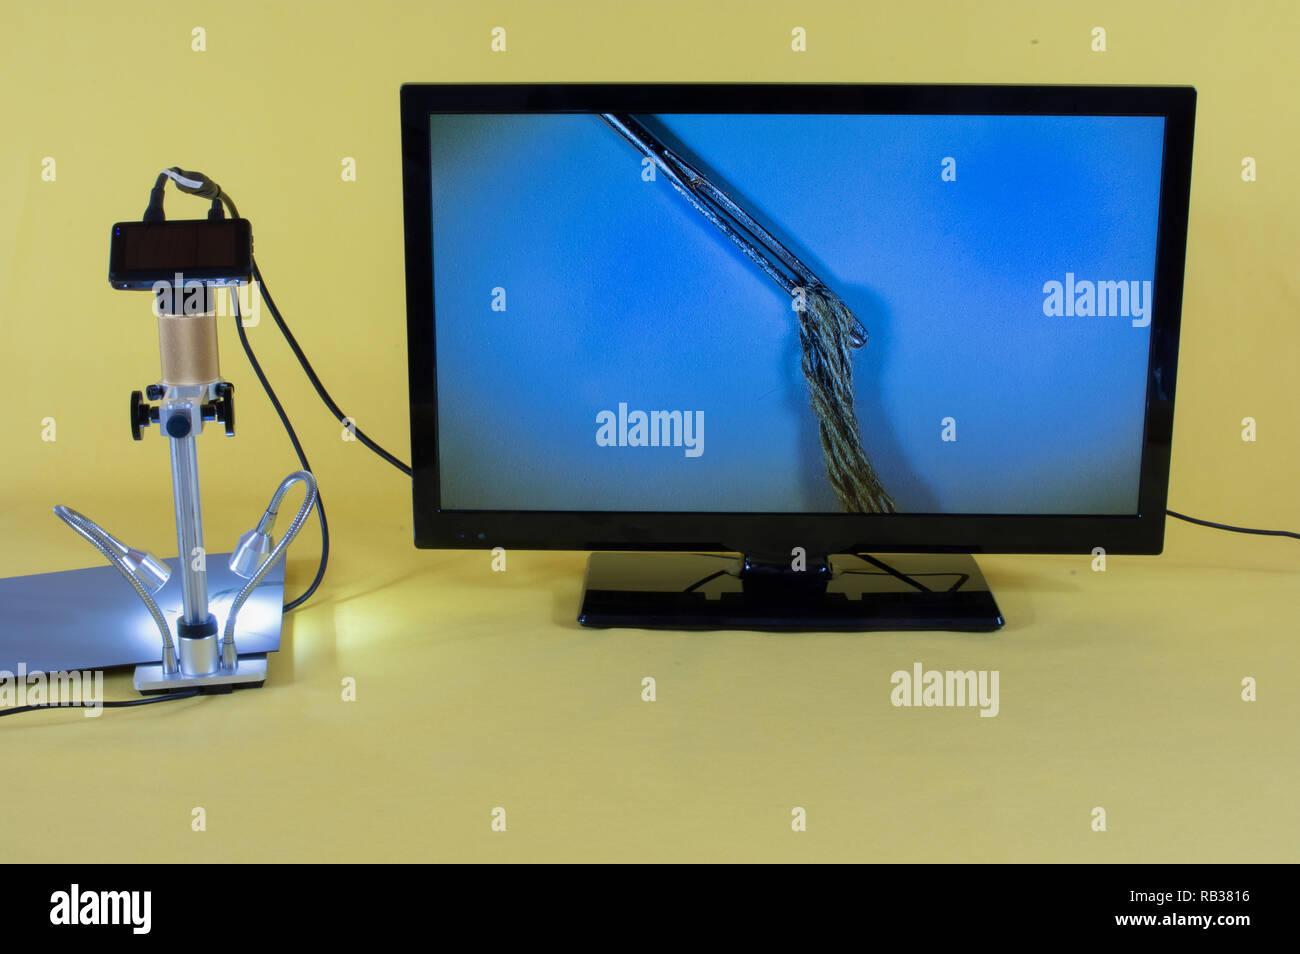 Elektro Mikroskop - Stock Image